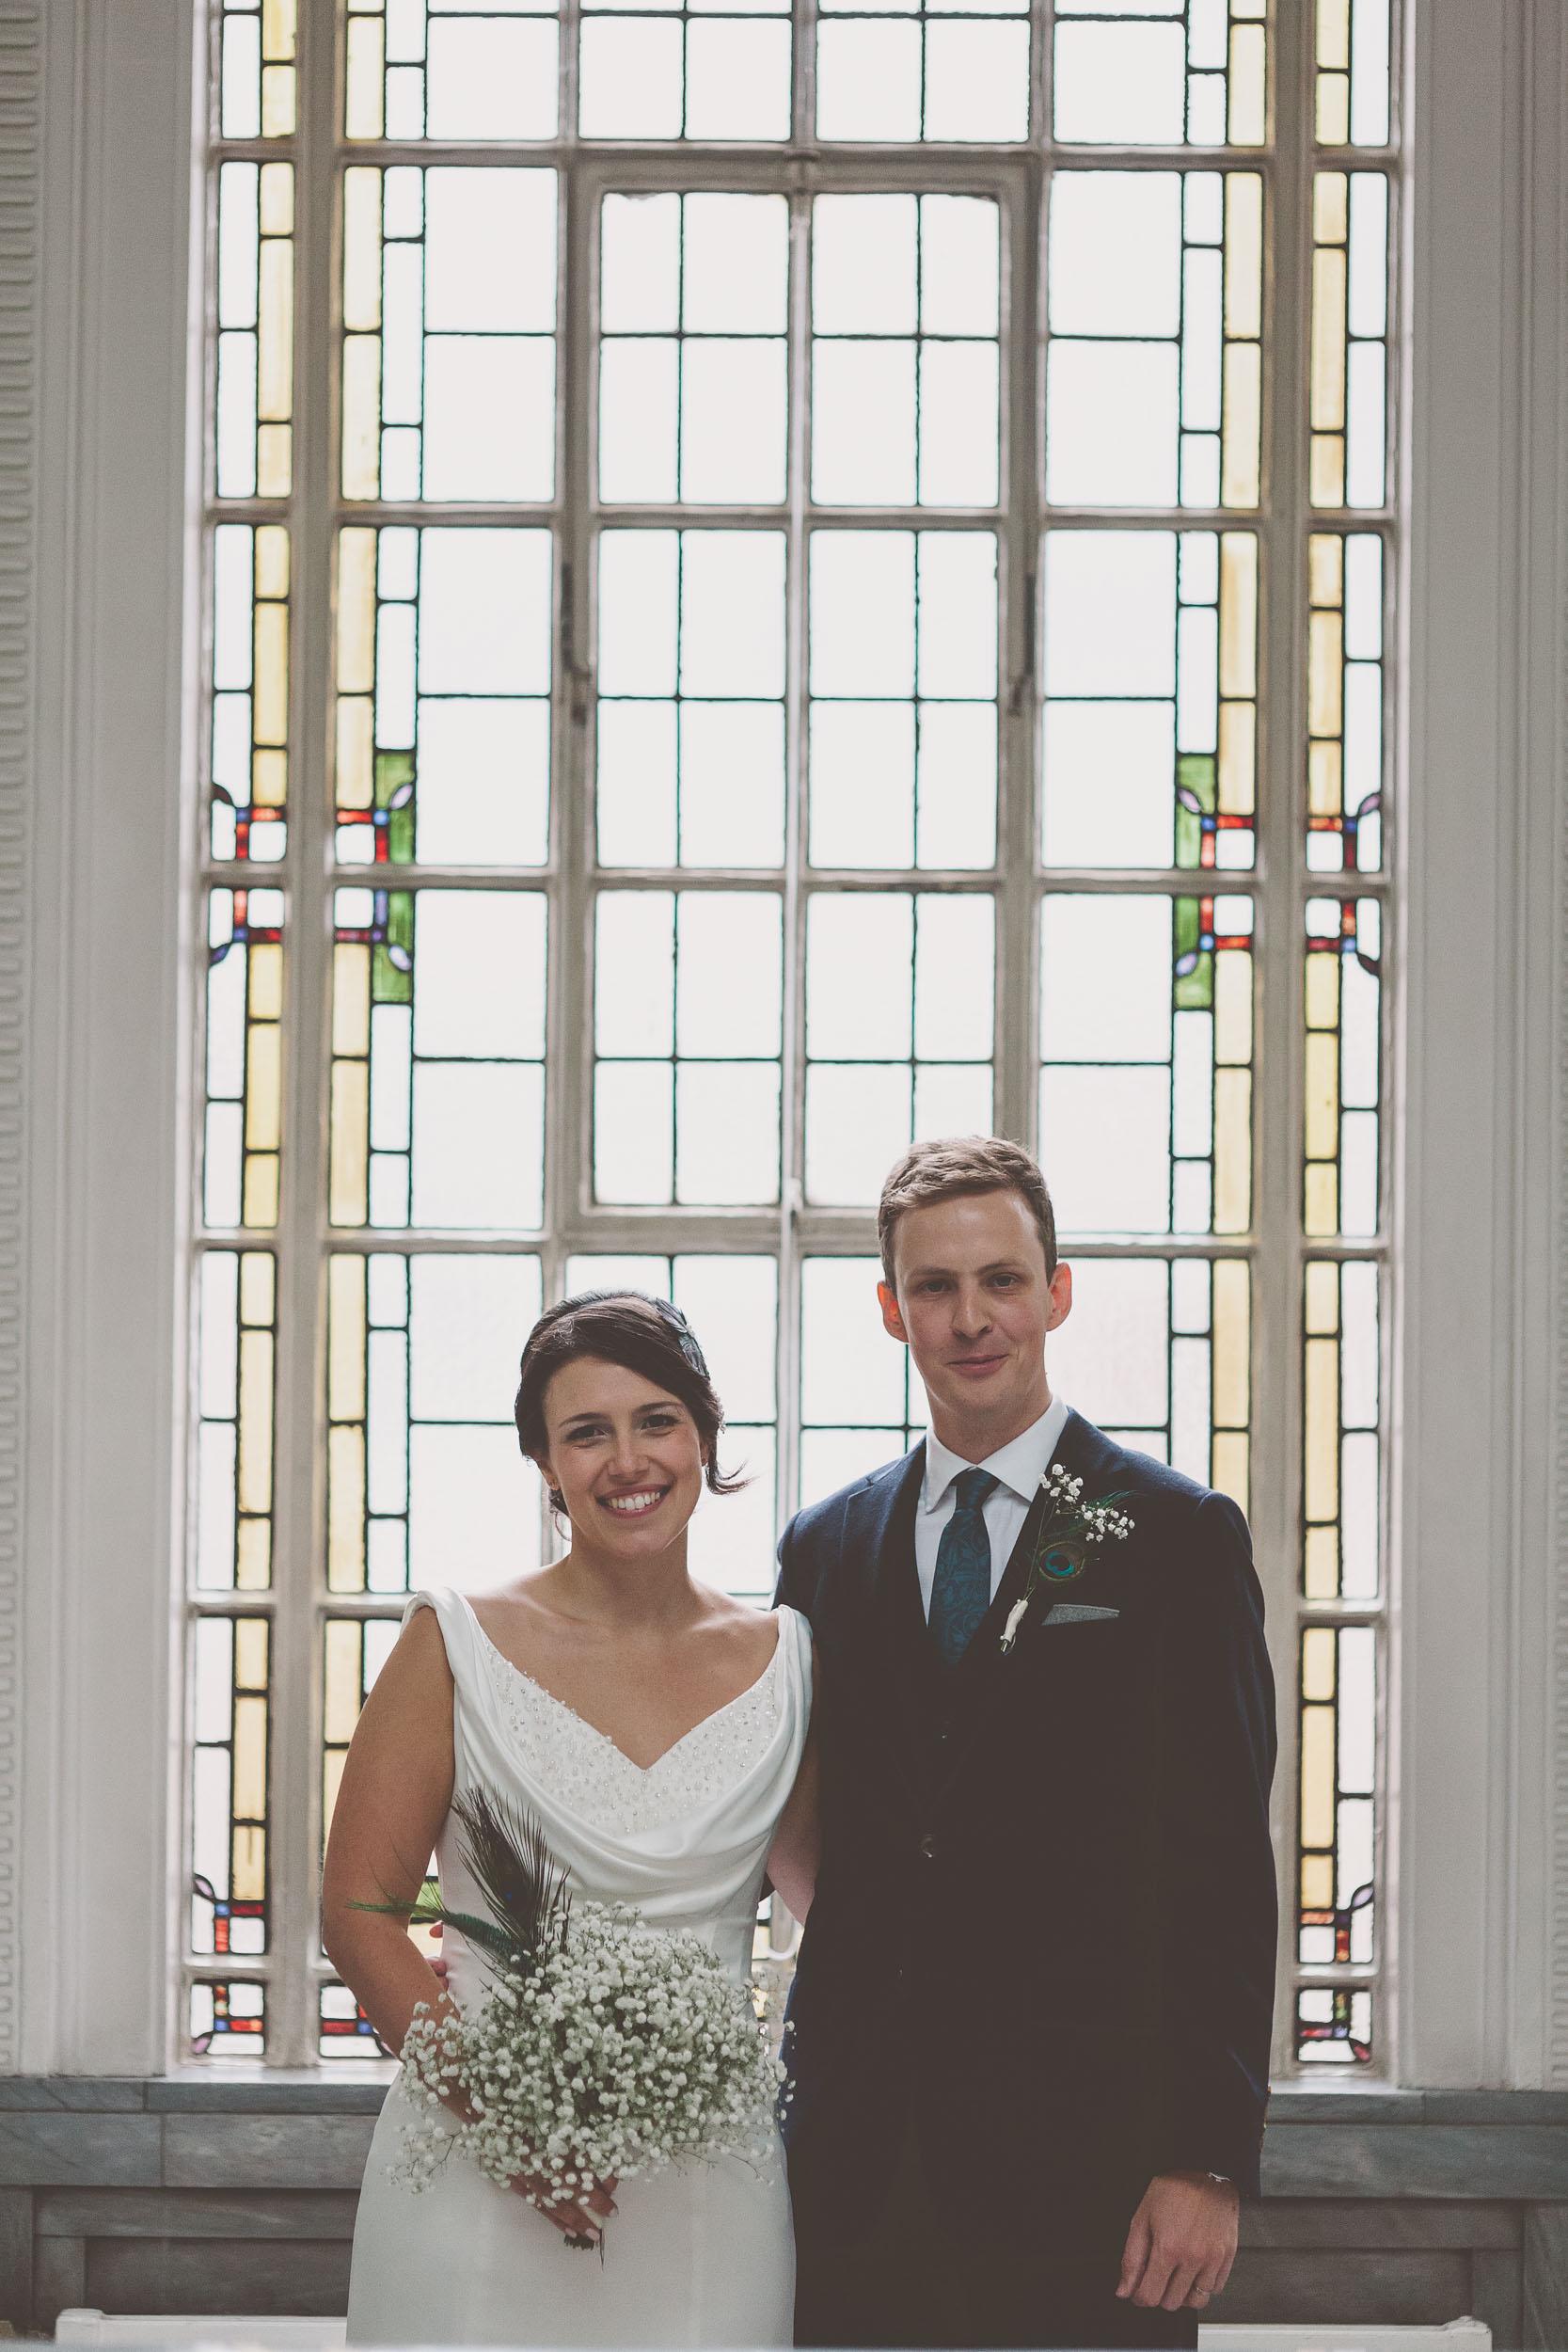 islington-town-hall-4th-floor-studios-wedding136.jpg